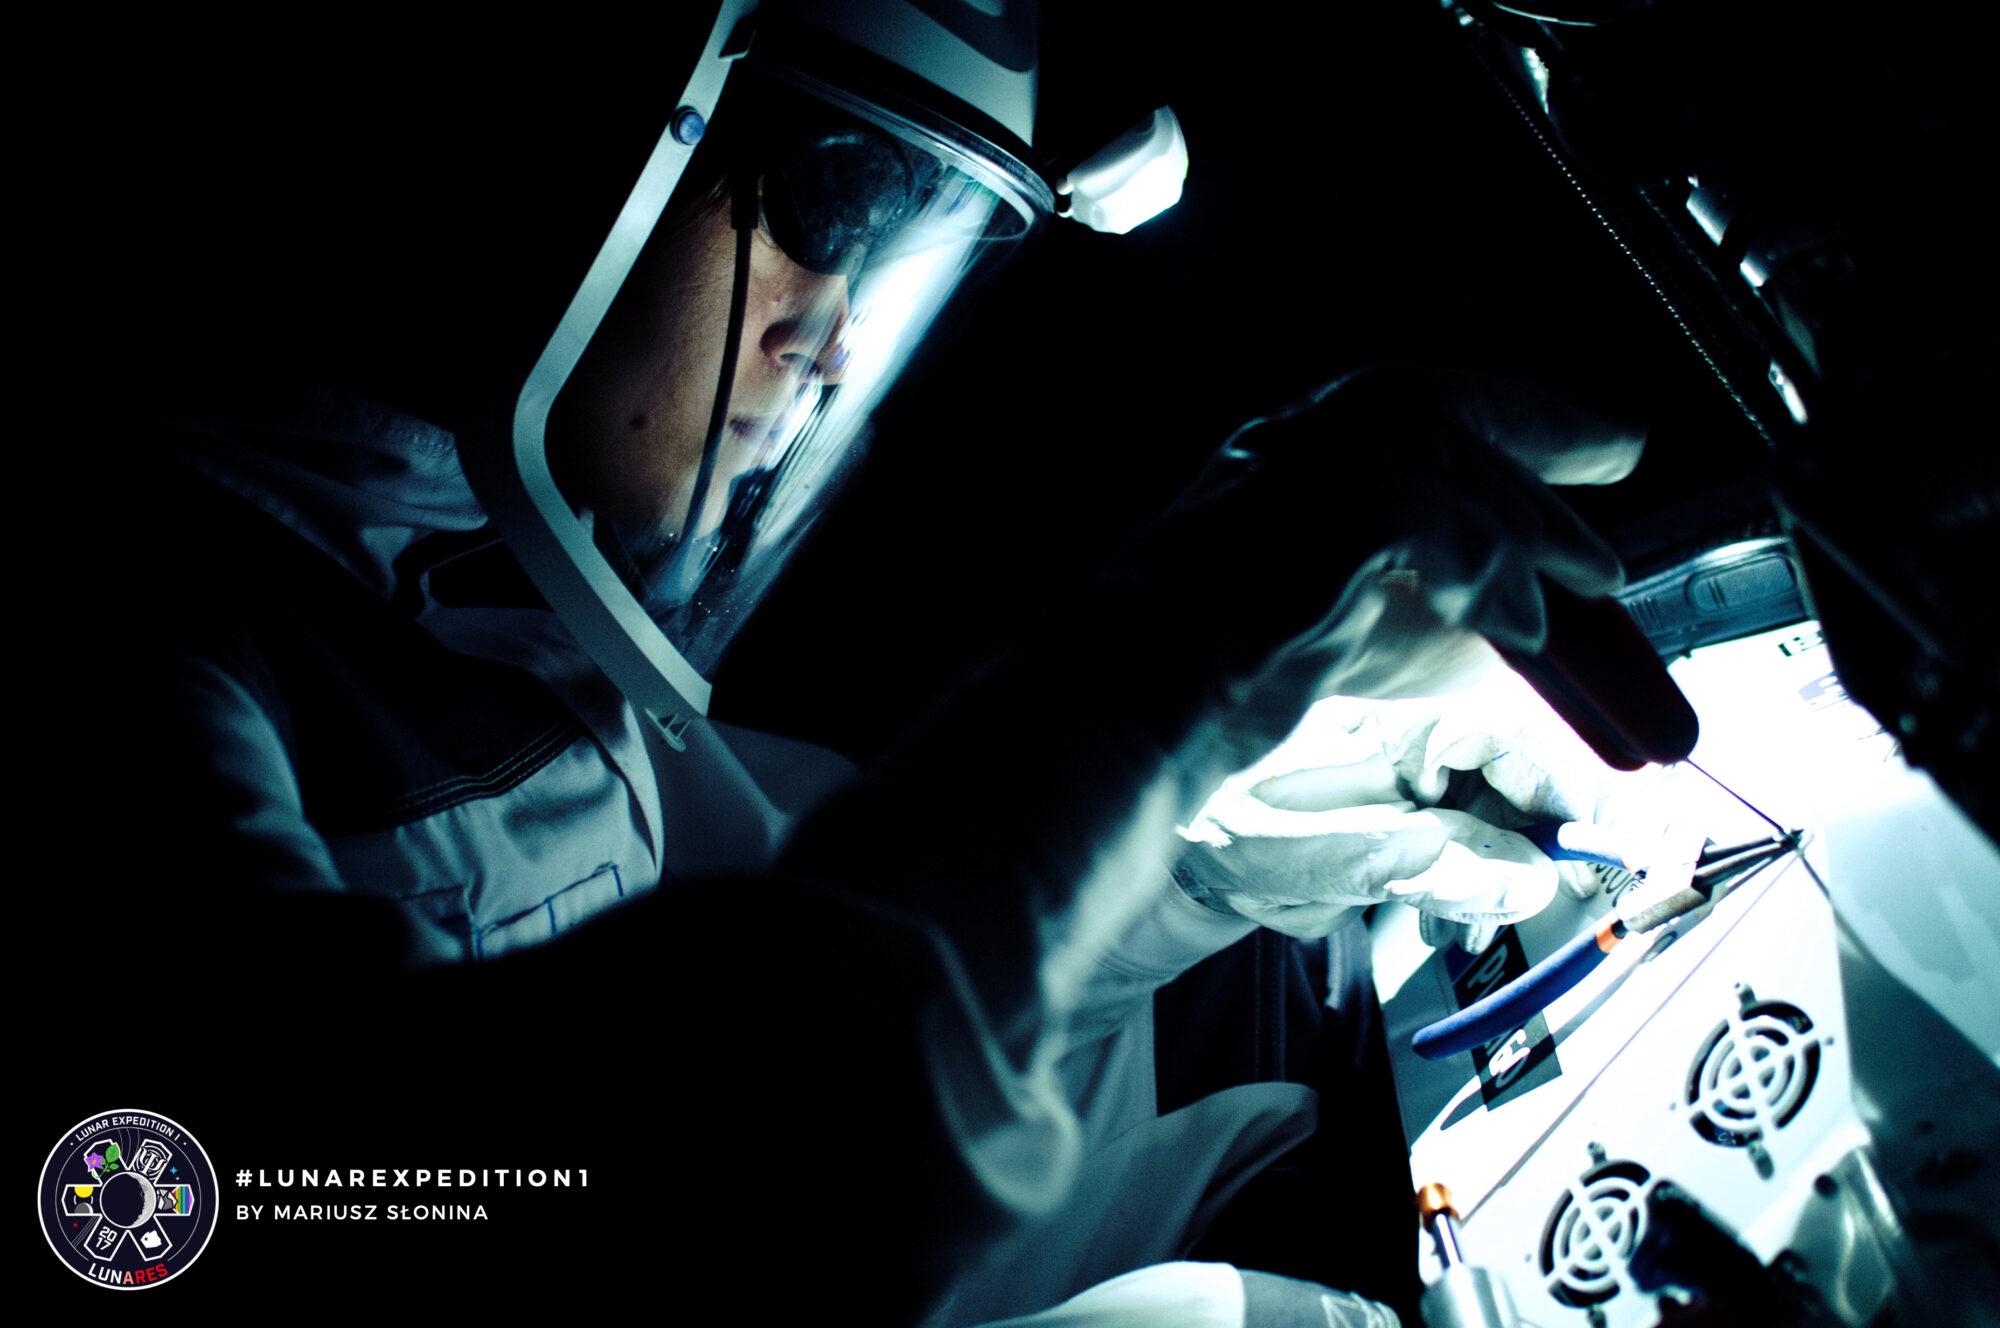 lunar-expedition-01/ND_20170820_170850_1736_001.jpg